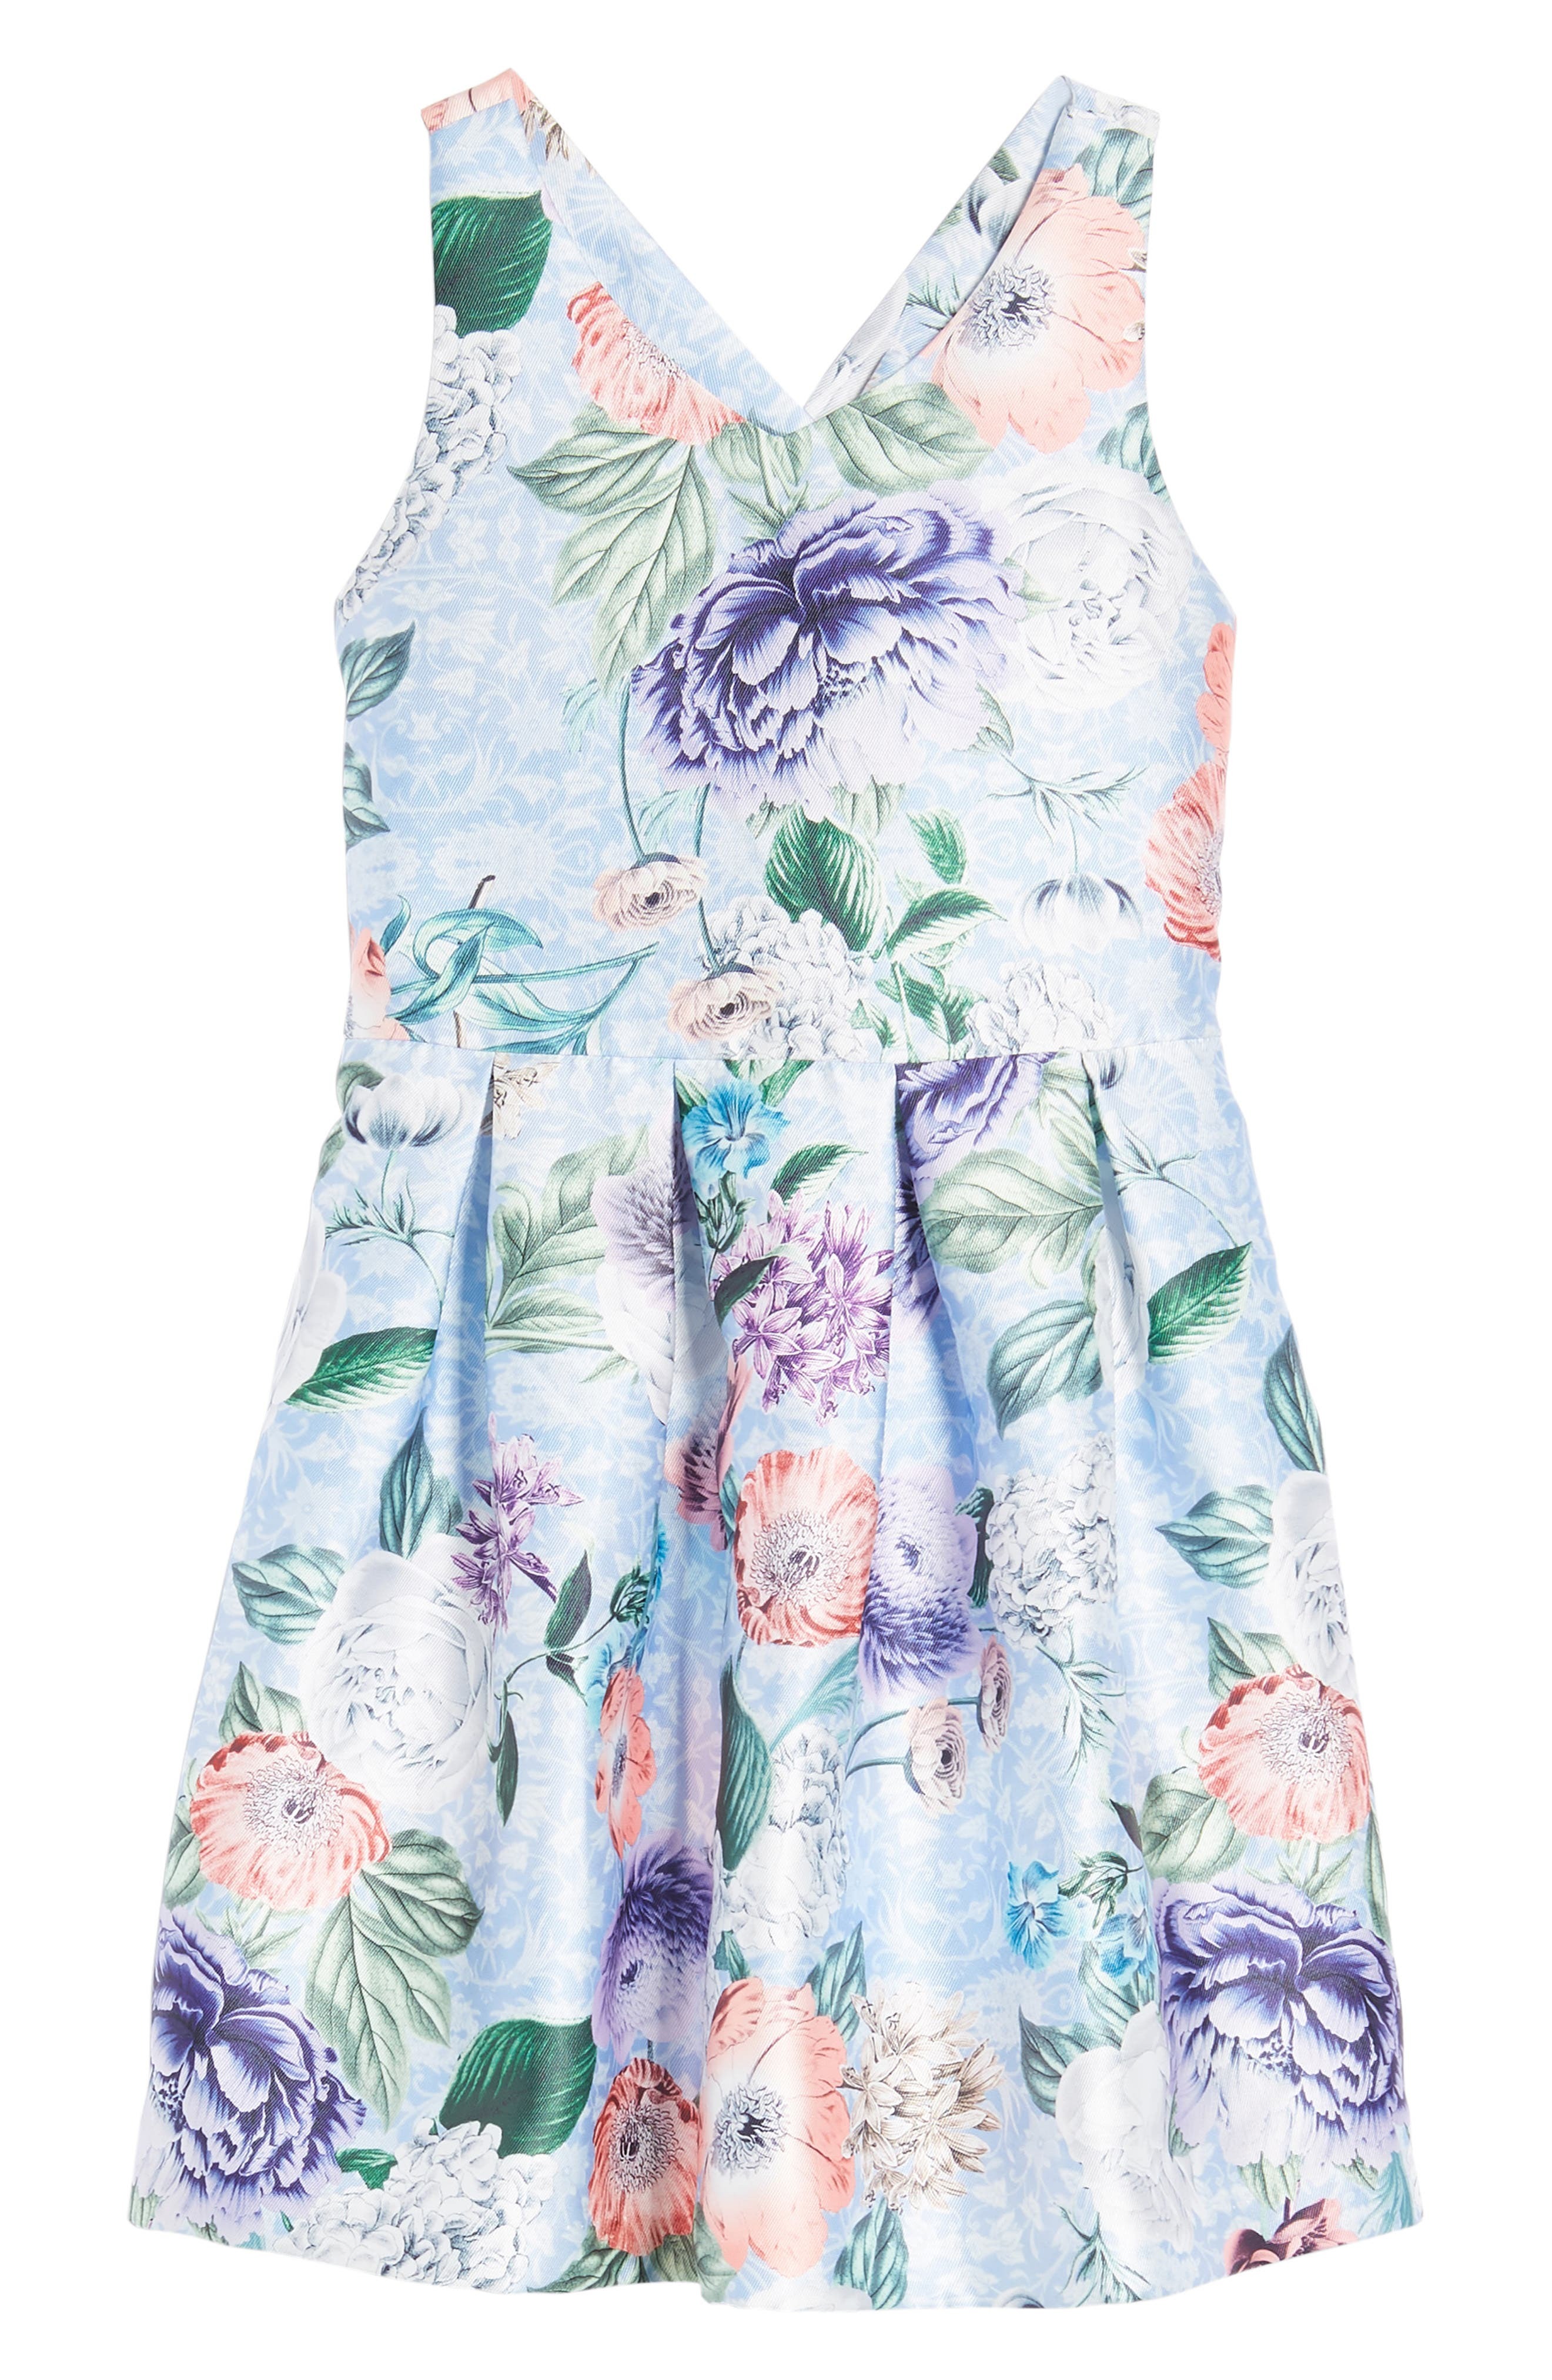 Floral Cross Back Dress,                             Main thumbnail 1, color,                             Blue Multi